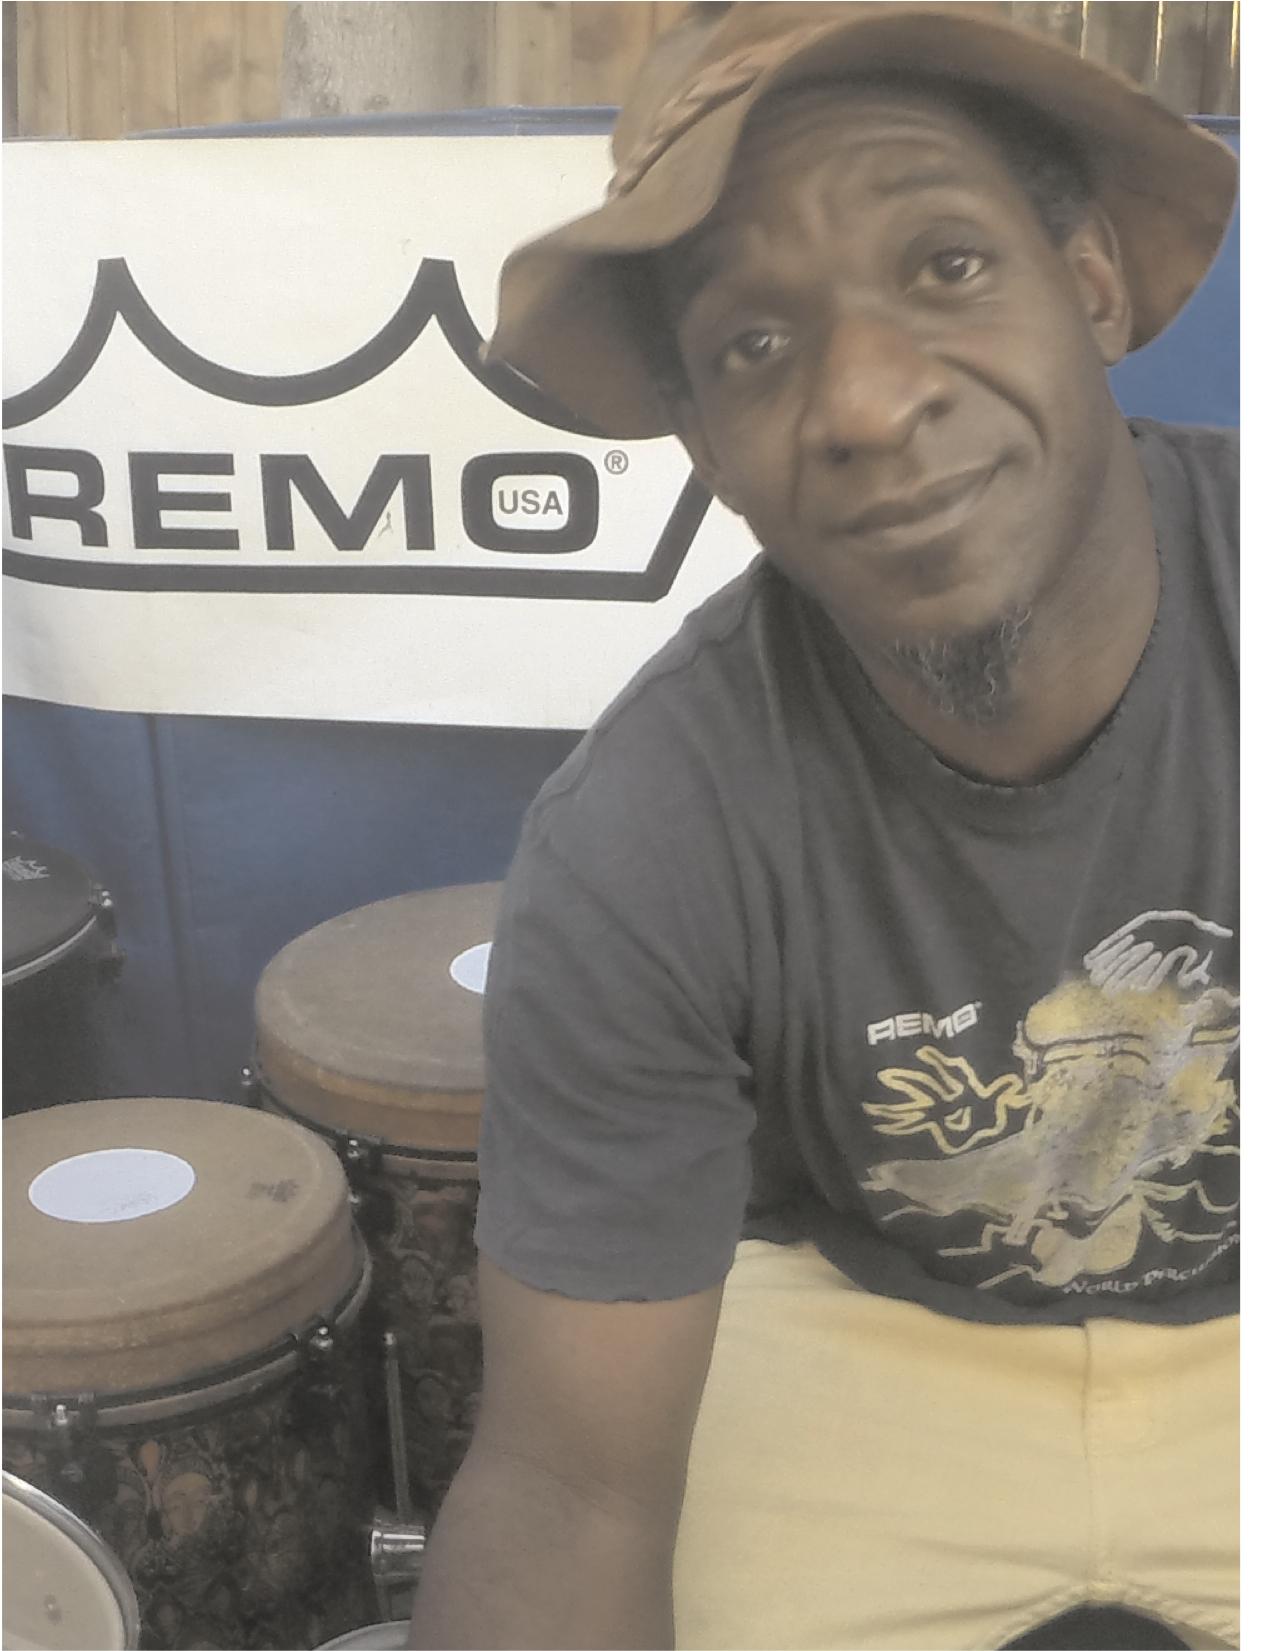 Remo endorsement artist